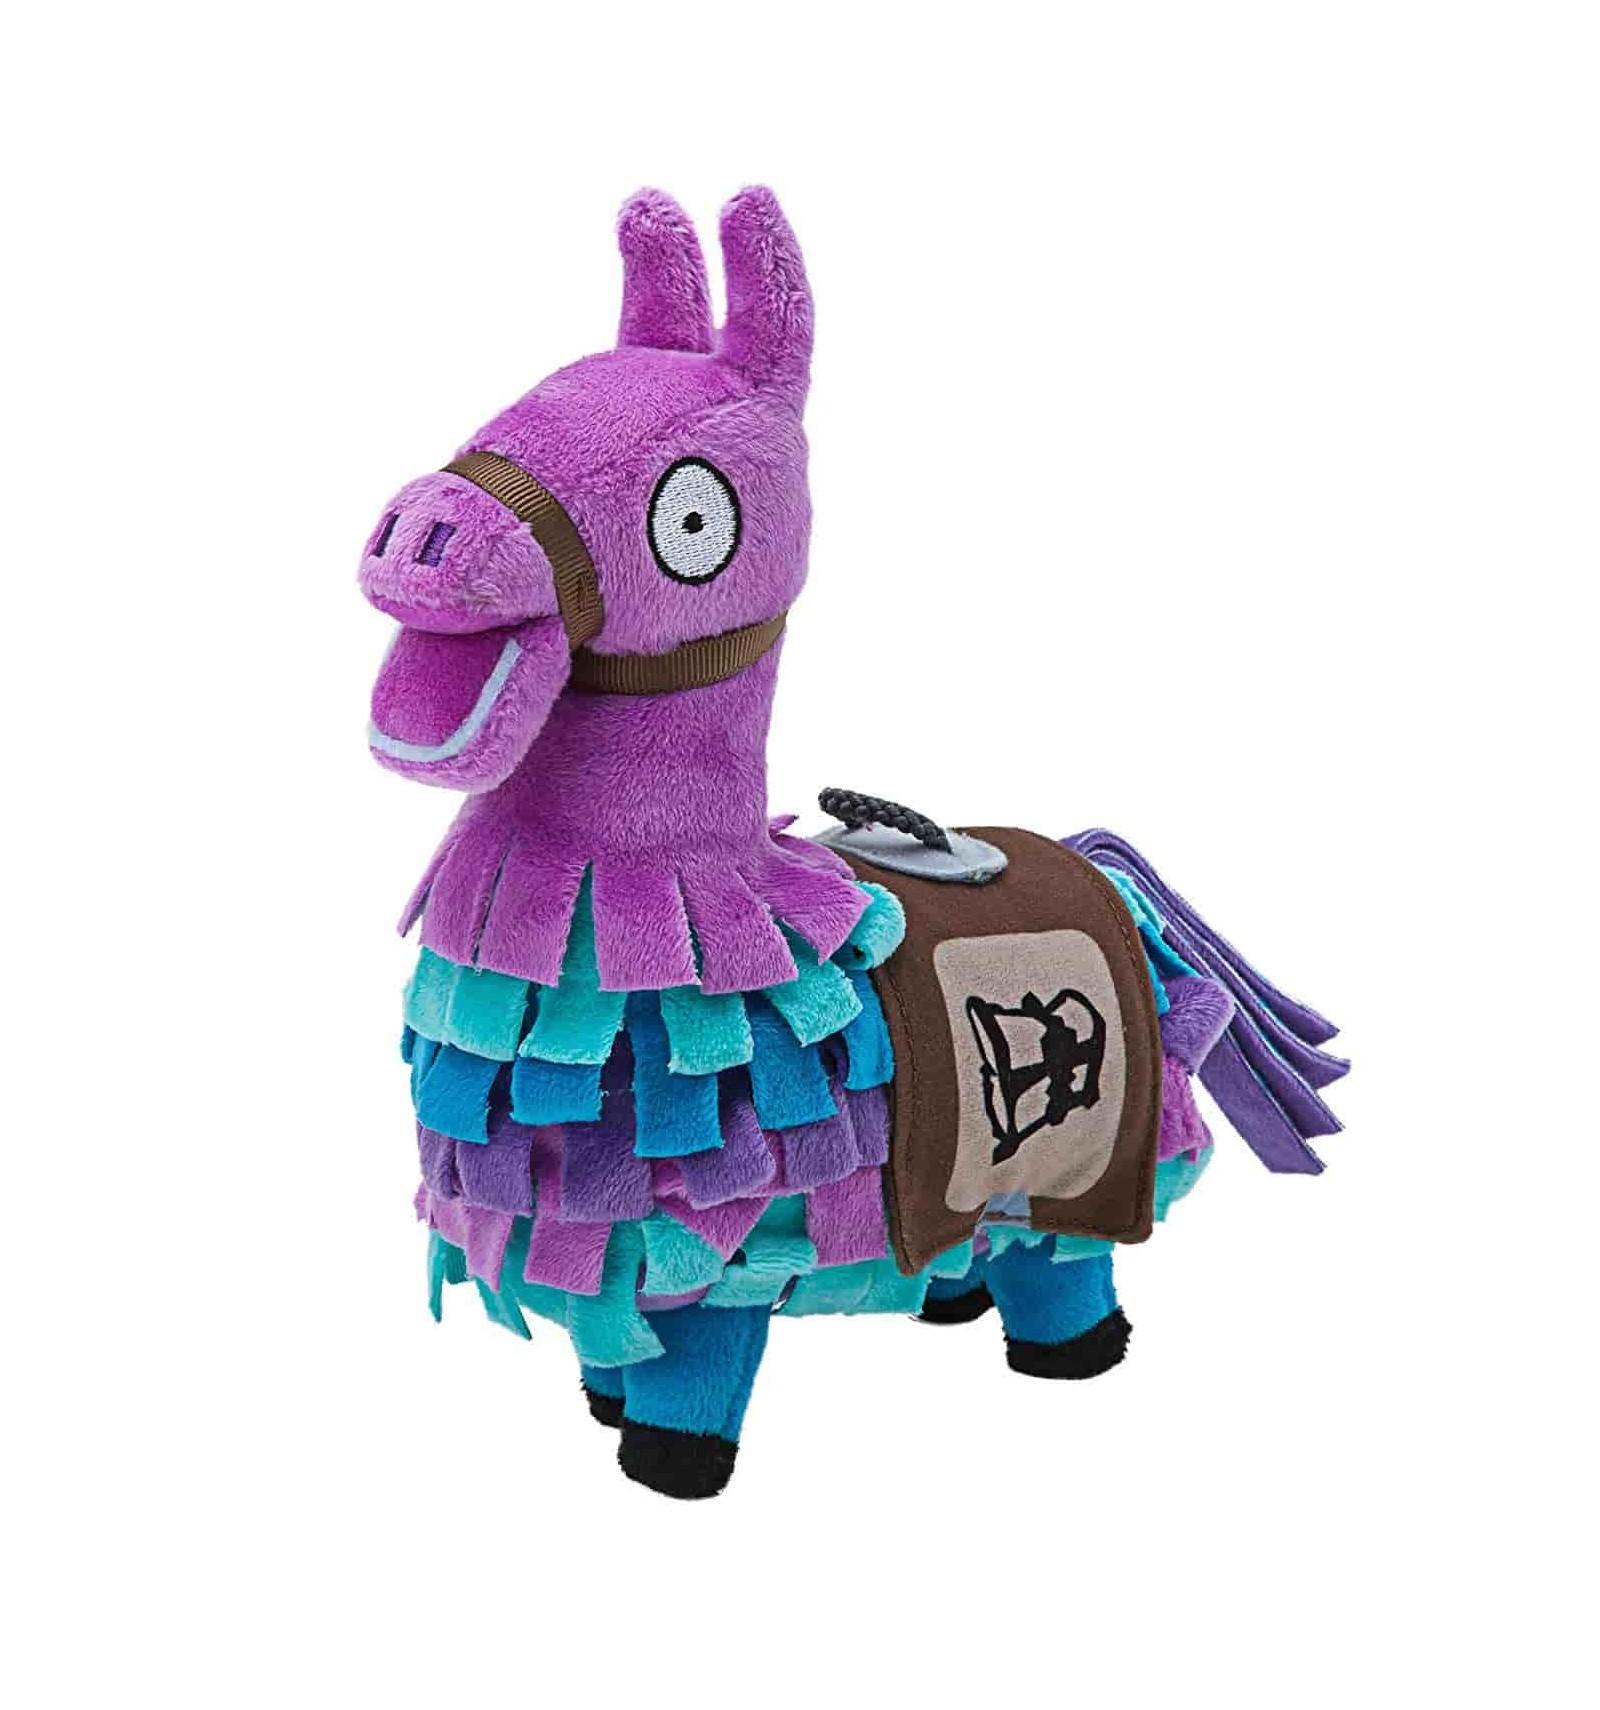 Peluche Llama Drama Fornite Llama Fortnite